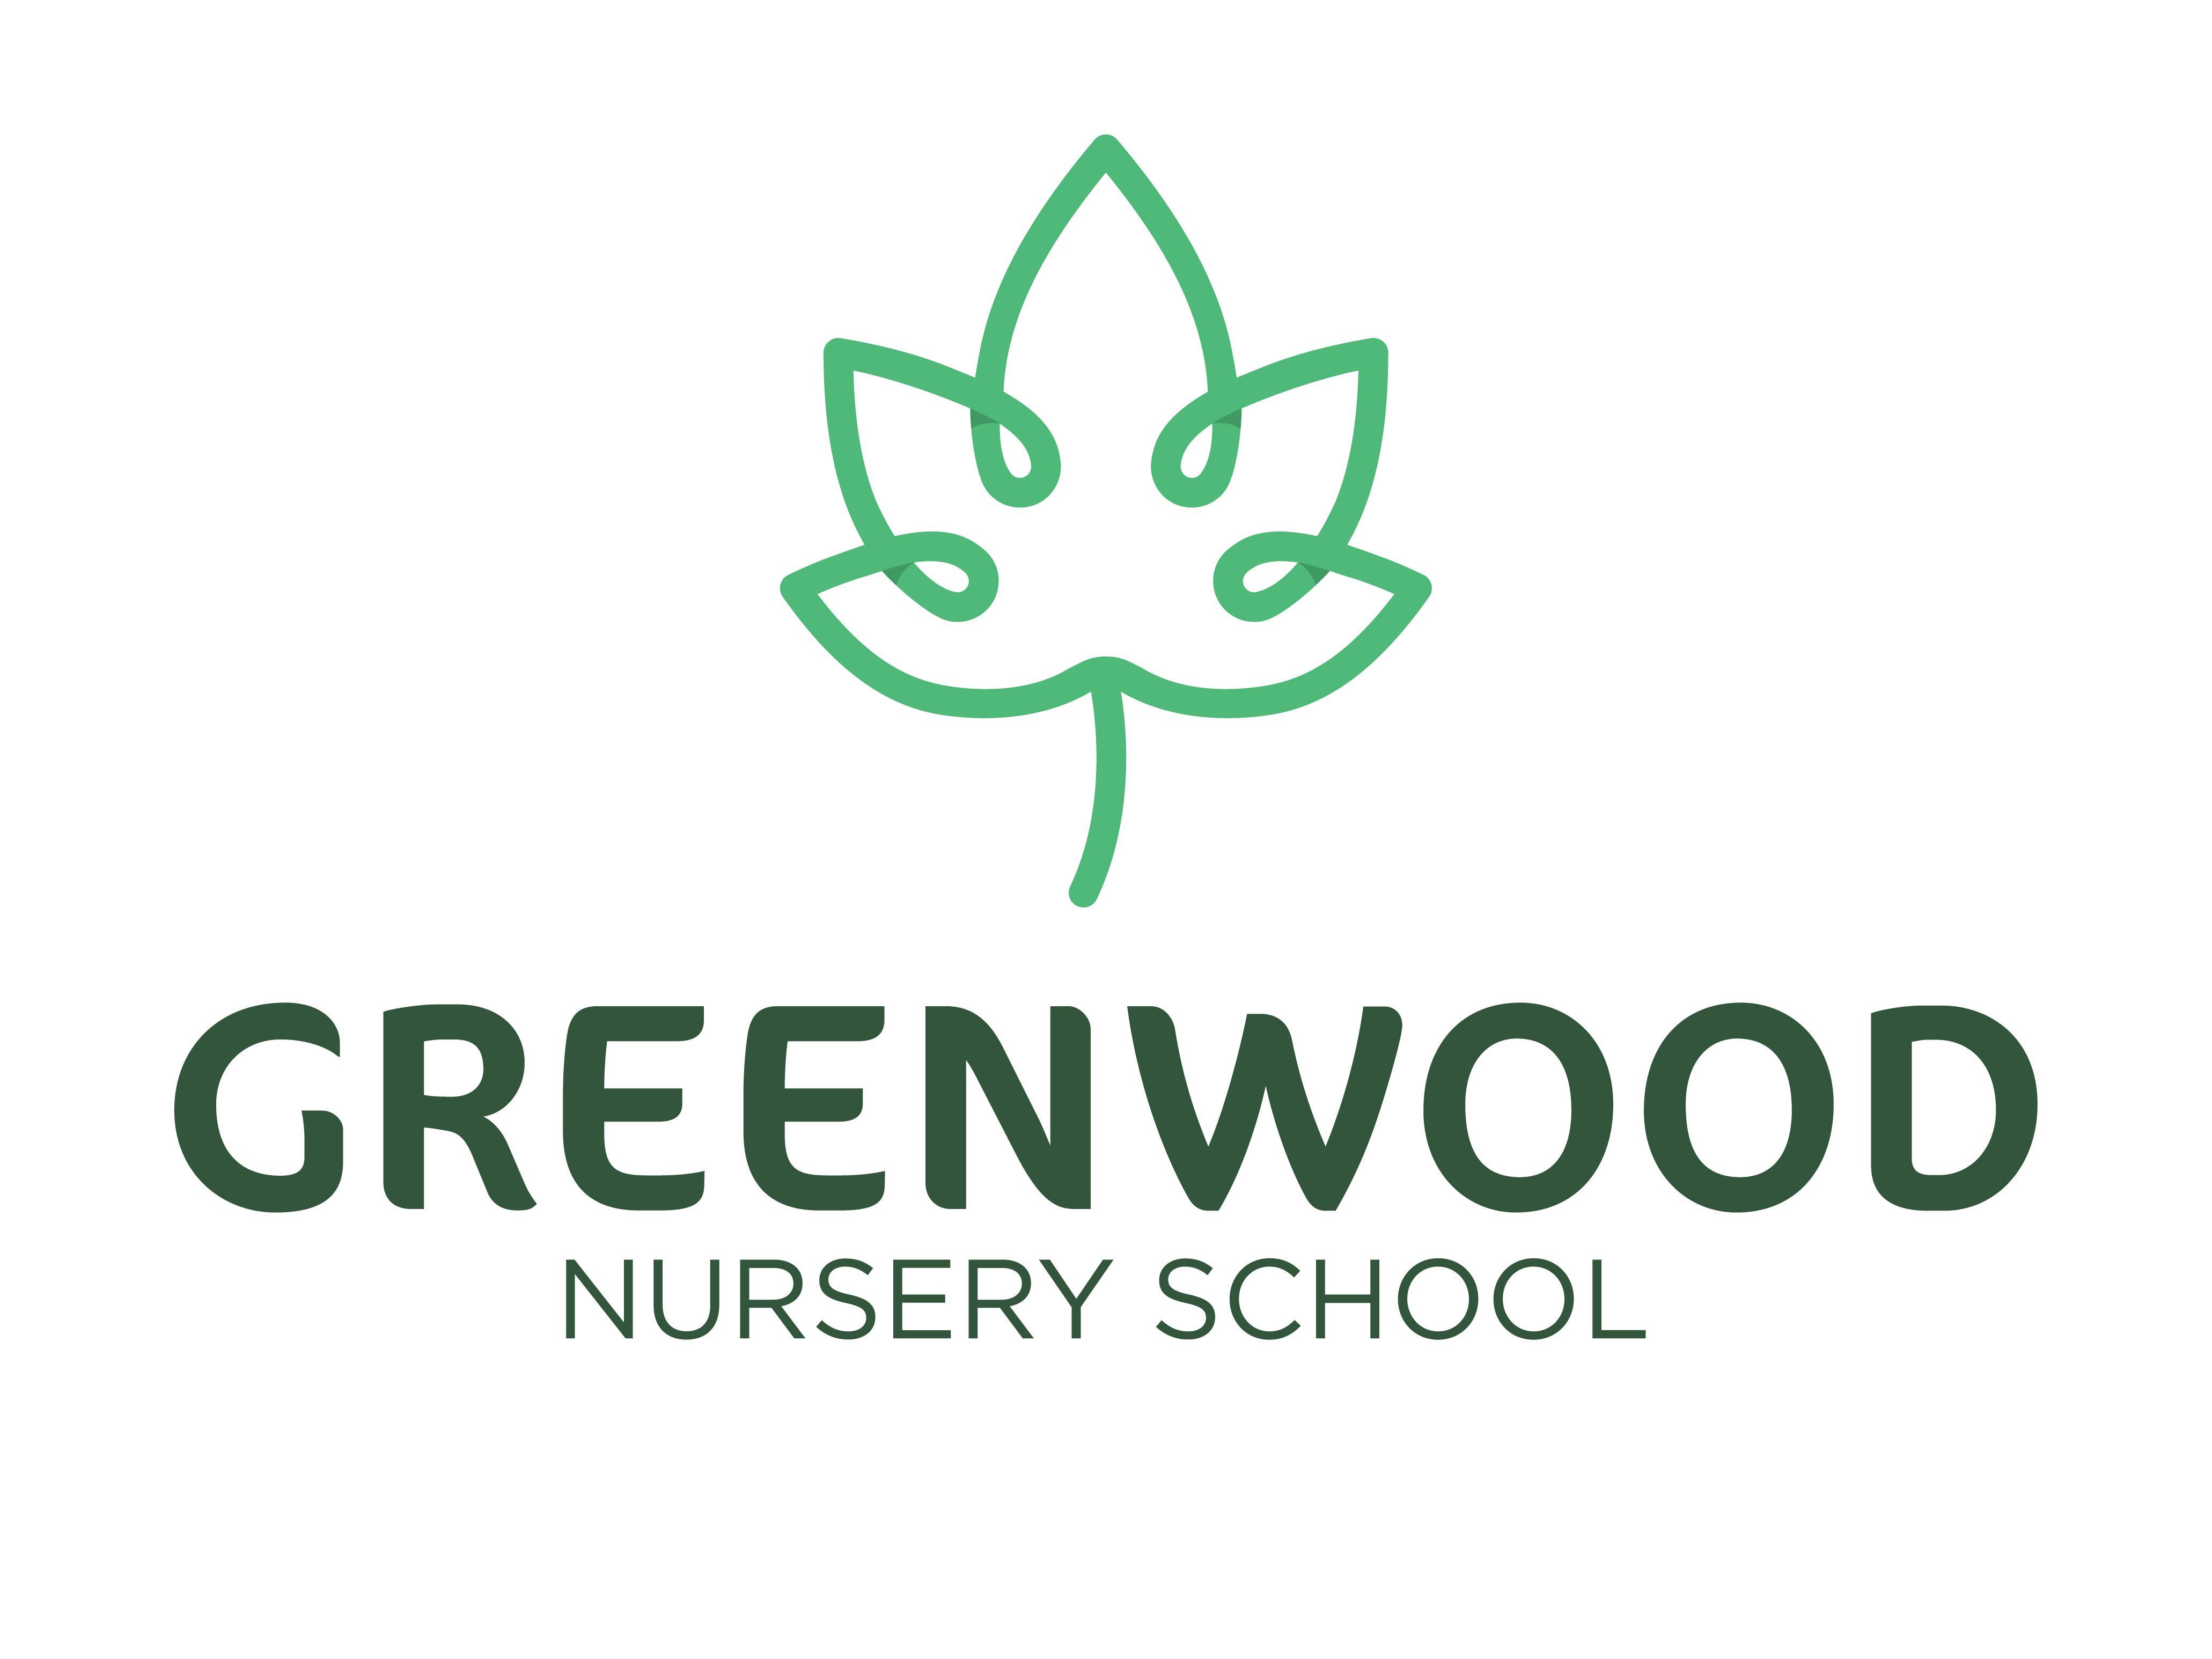 Greenwood Nursery School Brand